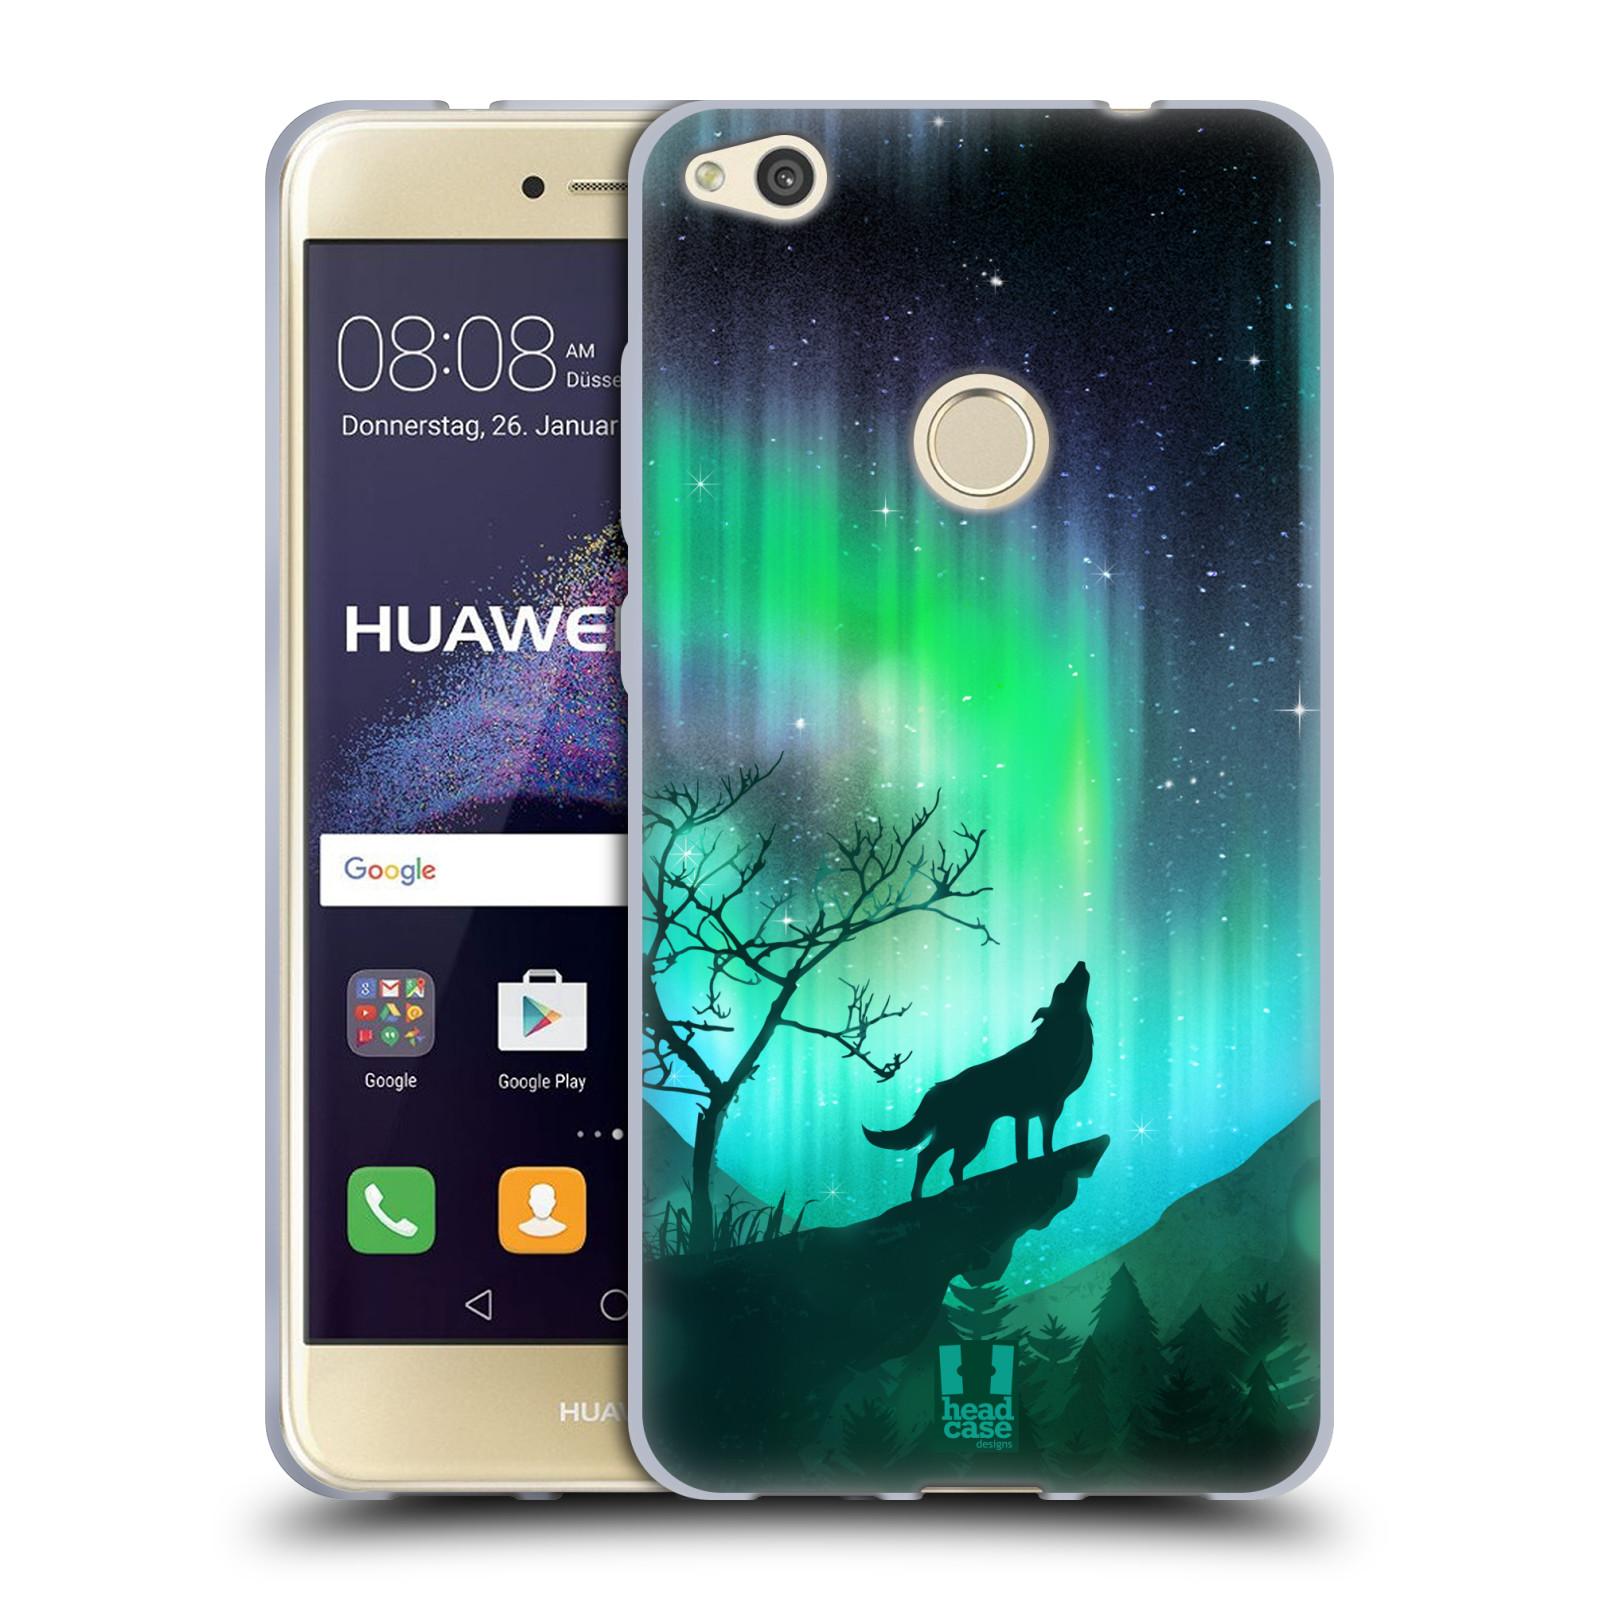 Silikonové pouzdro na mobil Huawei P9 Lite (2017) HEAD CASE POLÁRNÍ ZÁŘE VLK